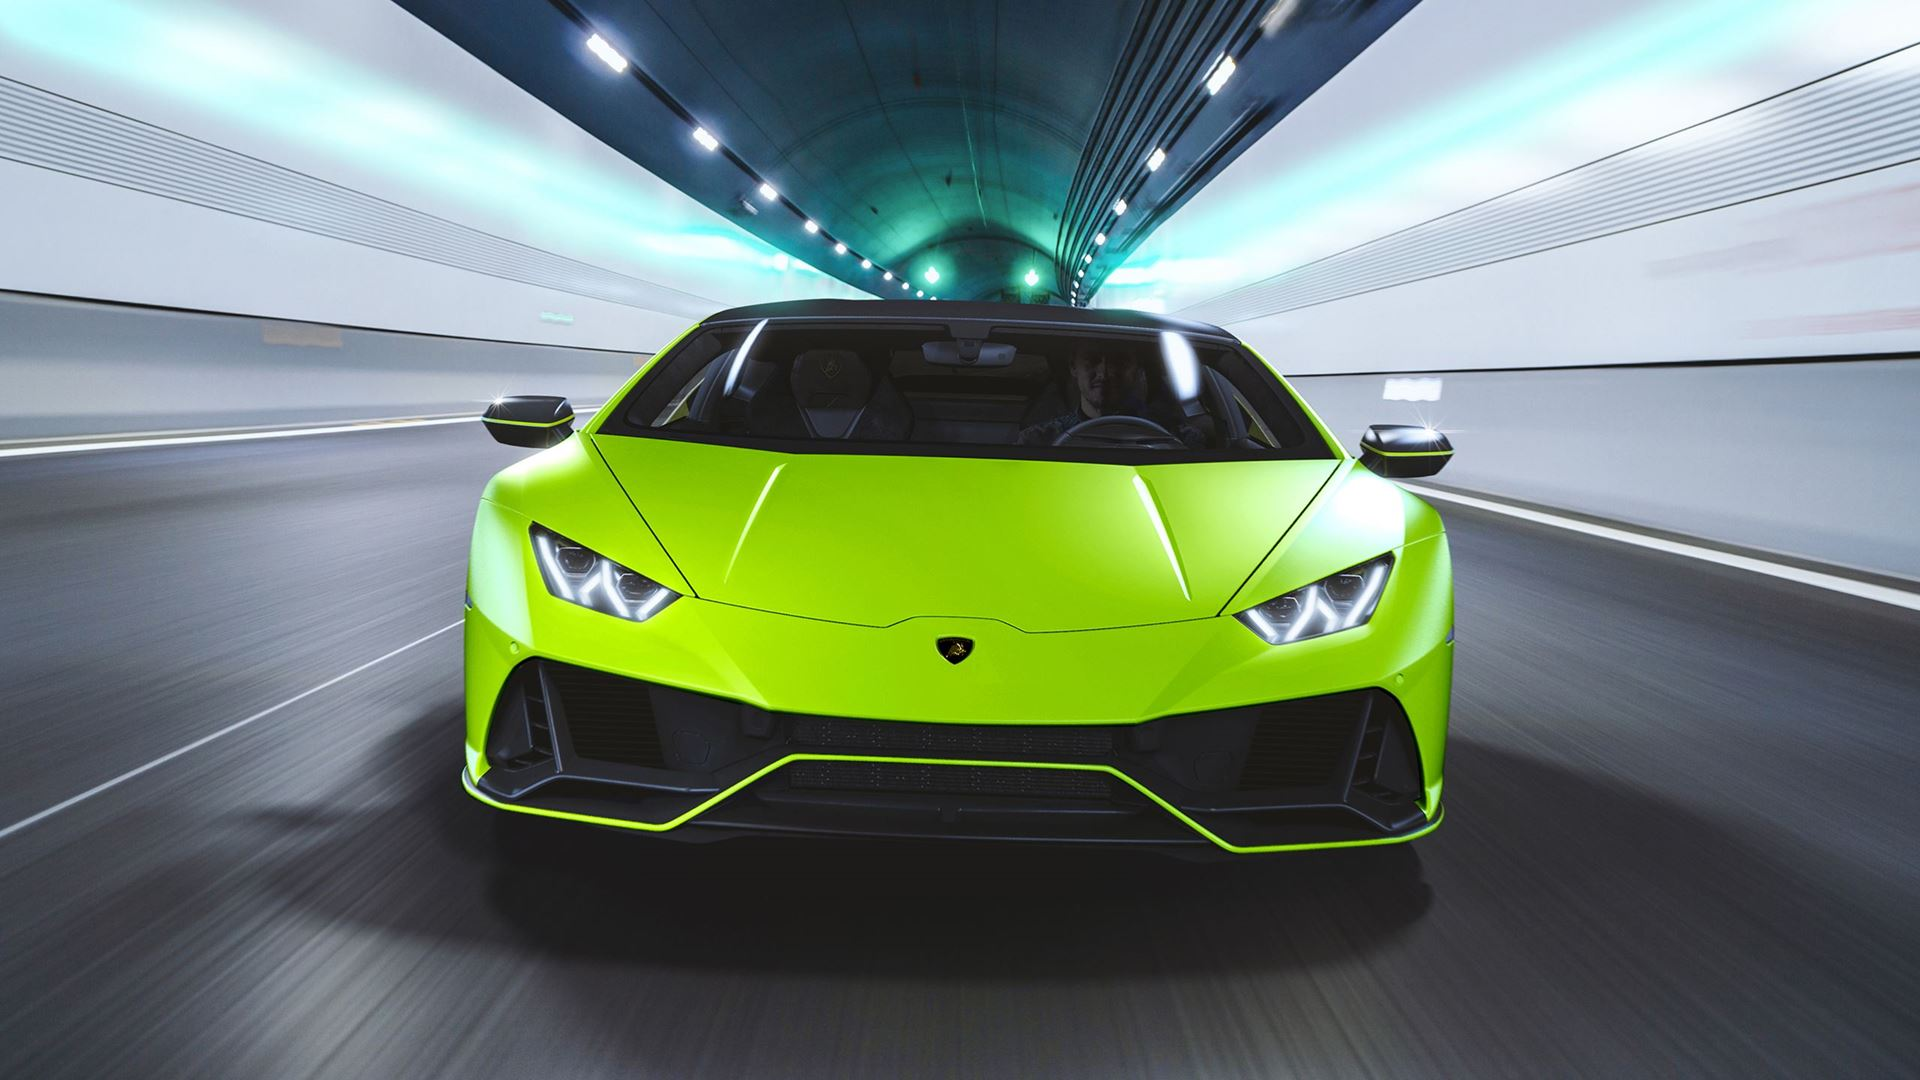 Daring elegance: Automobili Lamborghini presents the Huracán EVO Fluo Capsule - Image 6